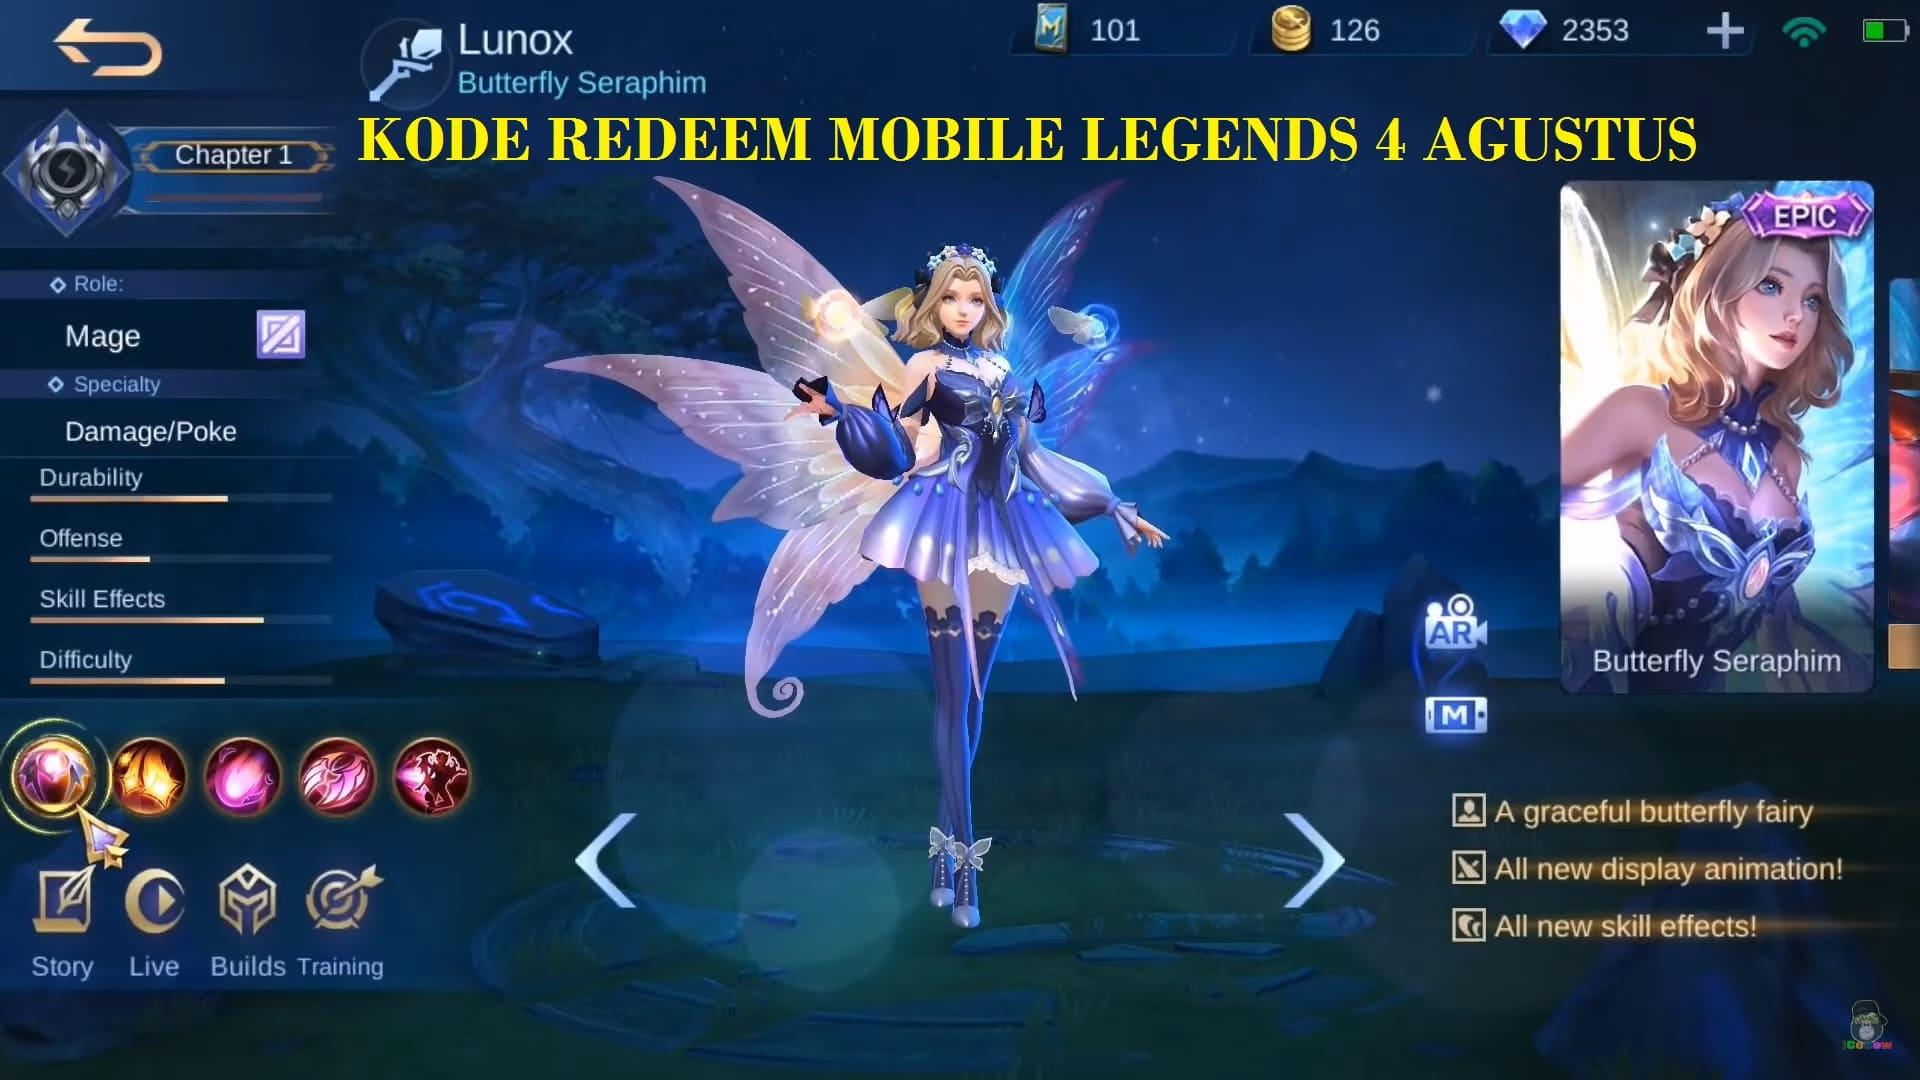 Update Terbaru Kode ML 4 Agustus 2020, Hadiah Skin Epic ...